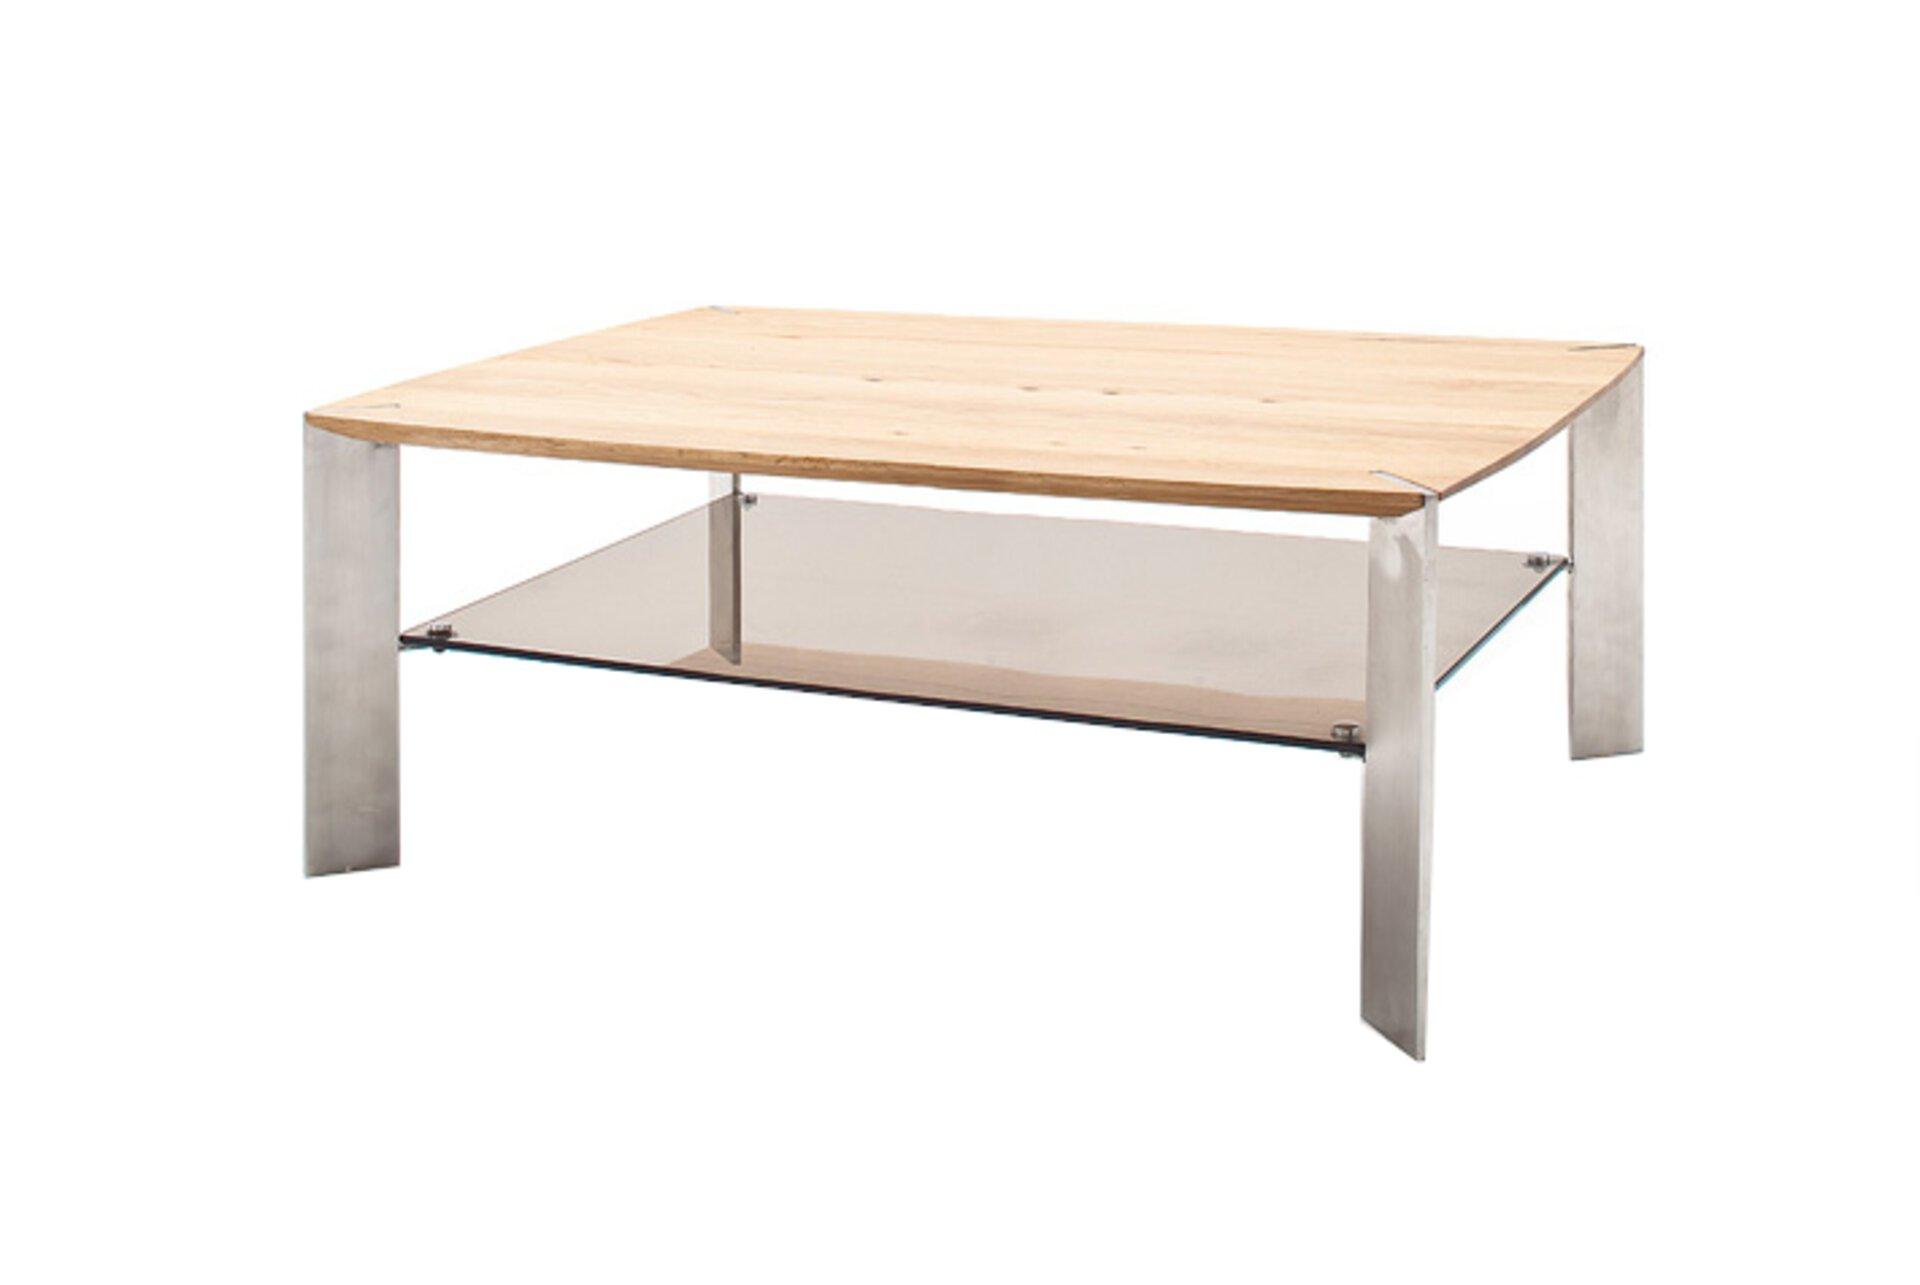 Couchtisch NELIA MCA furniture Metall mehrfarbig 70 x 41 x 120 cm